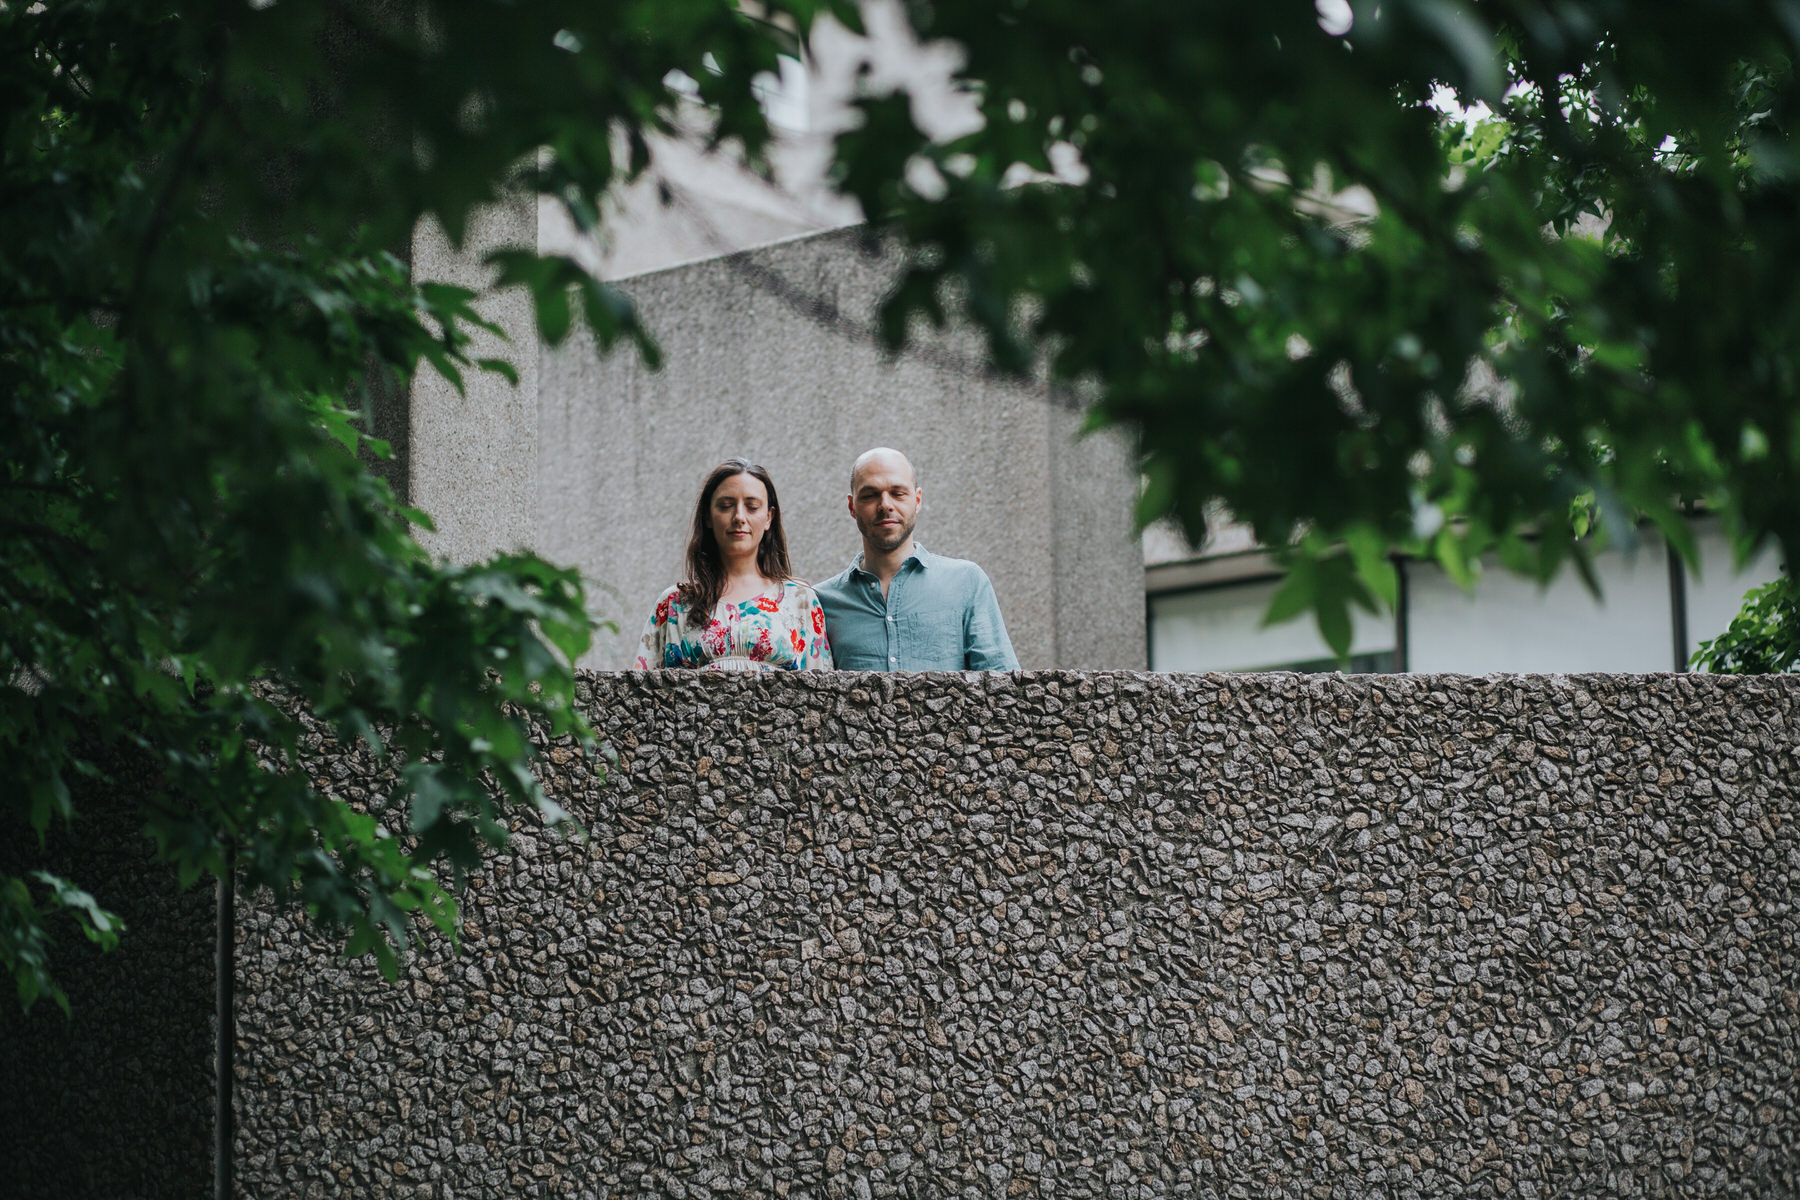 42-couple portrait shoot brutalist architecture green trees Southbank.jpg